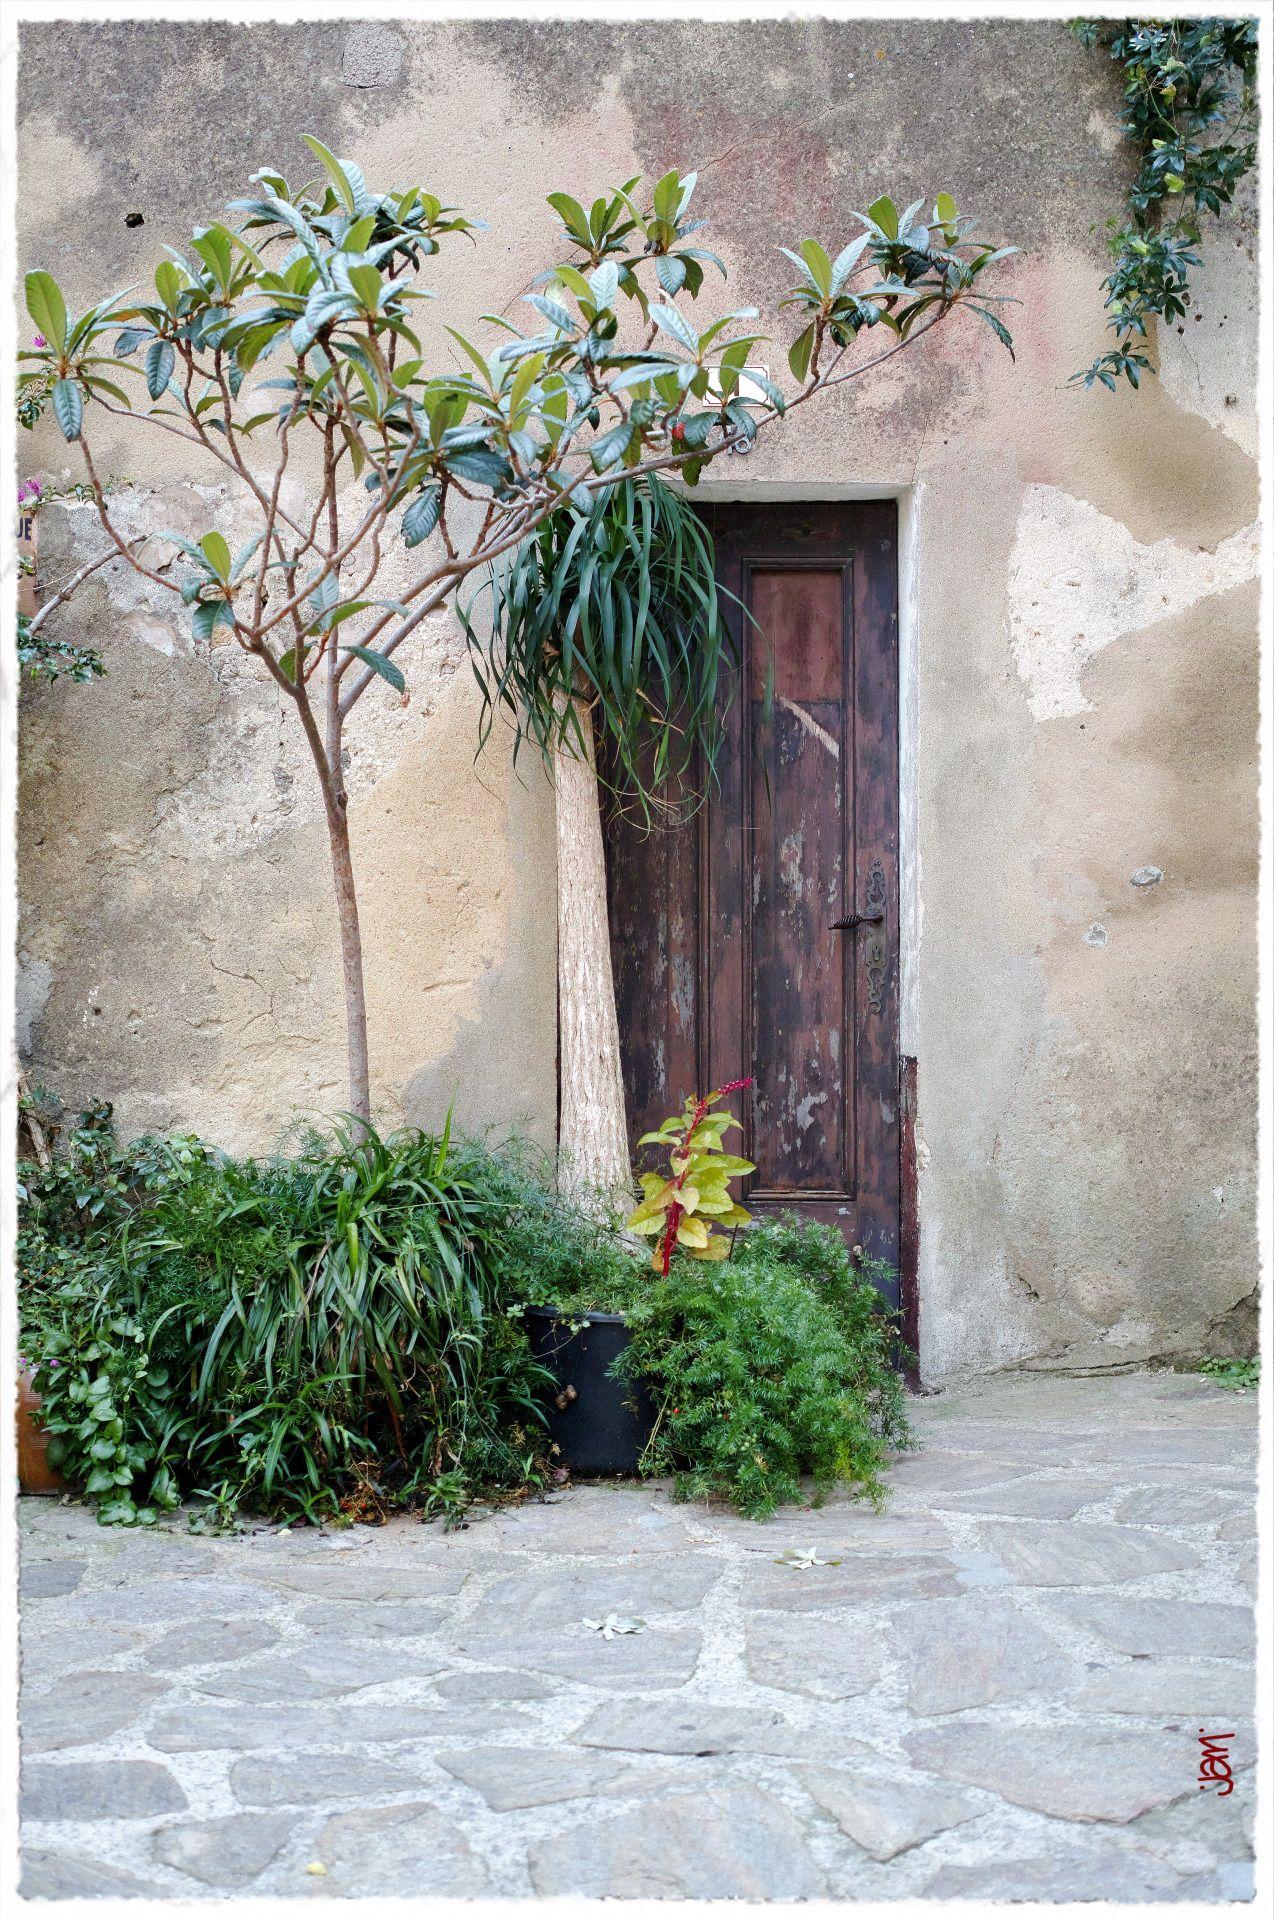 La petite porte camouflée (ou presque) … à Ramatuelle :-)